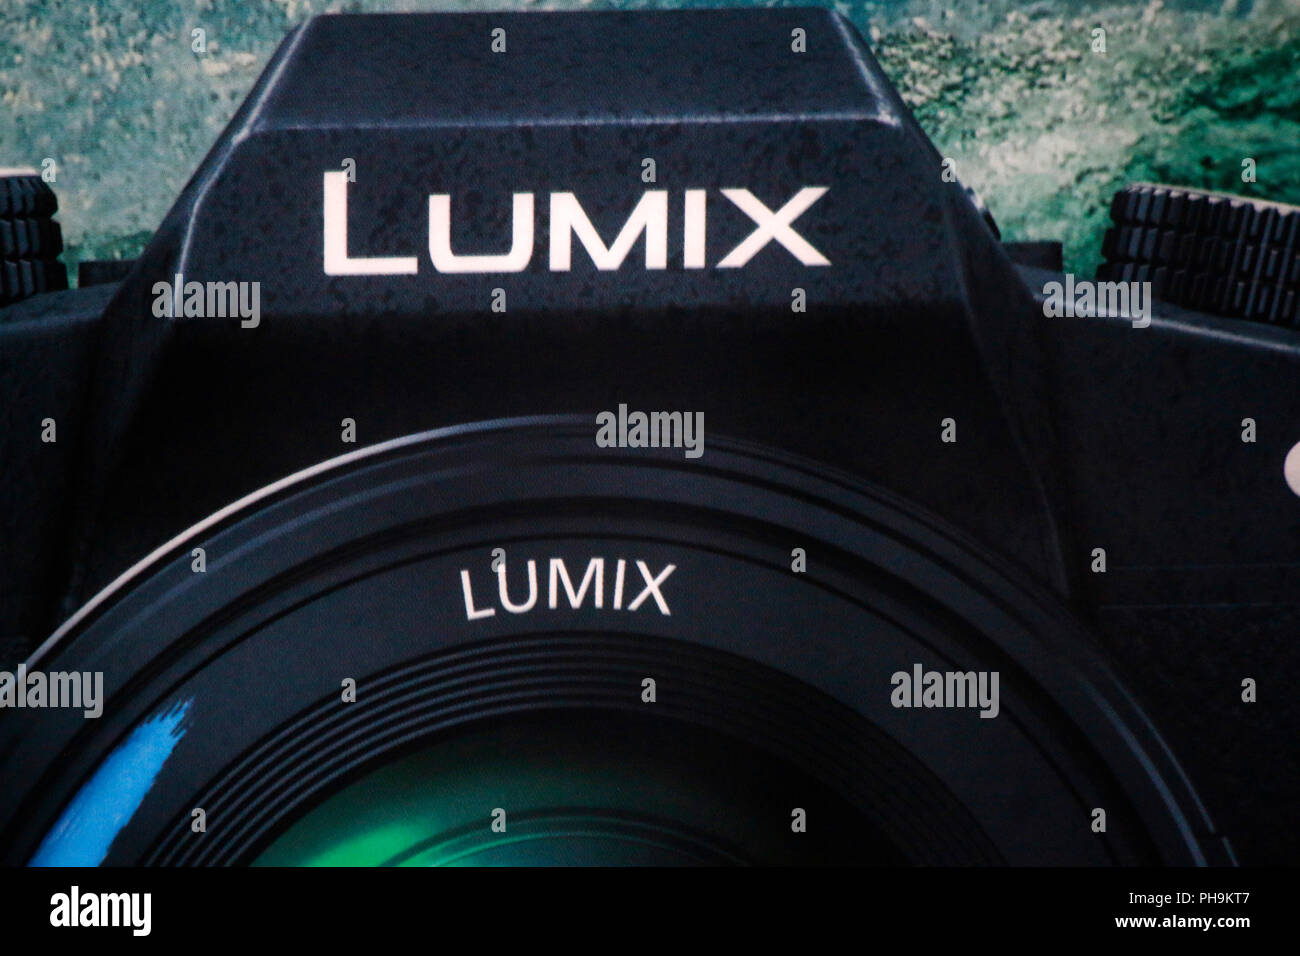 das Logo der Marke 'Panasonic Lumix G', Berlin. - Stock Image